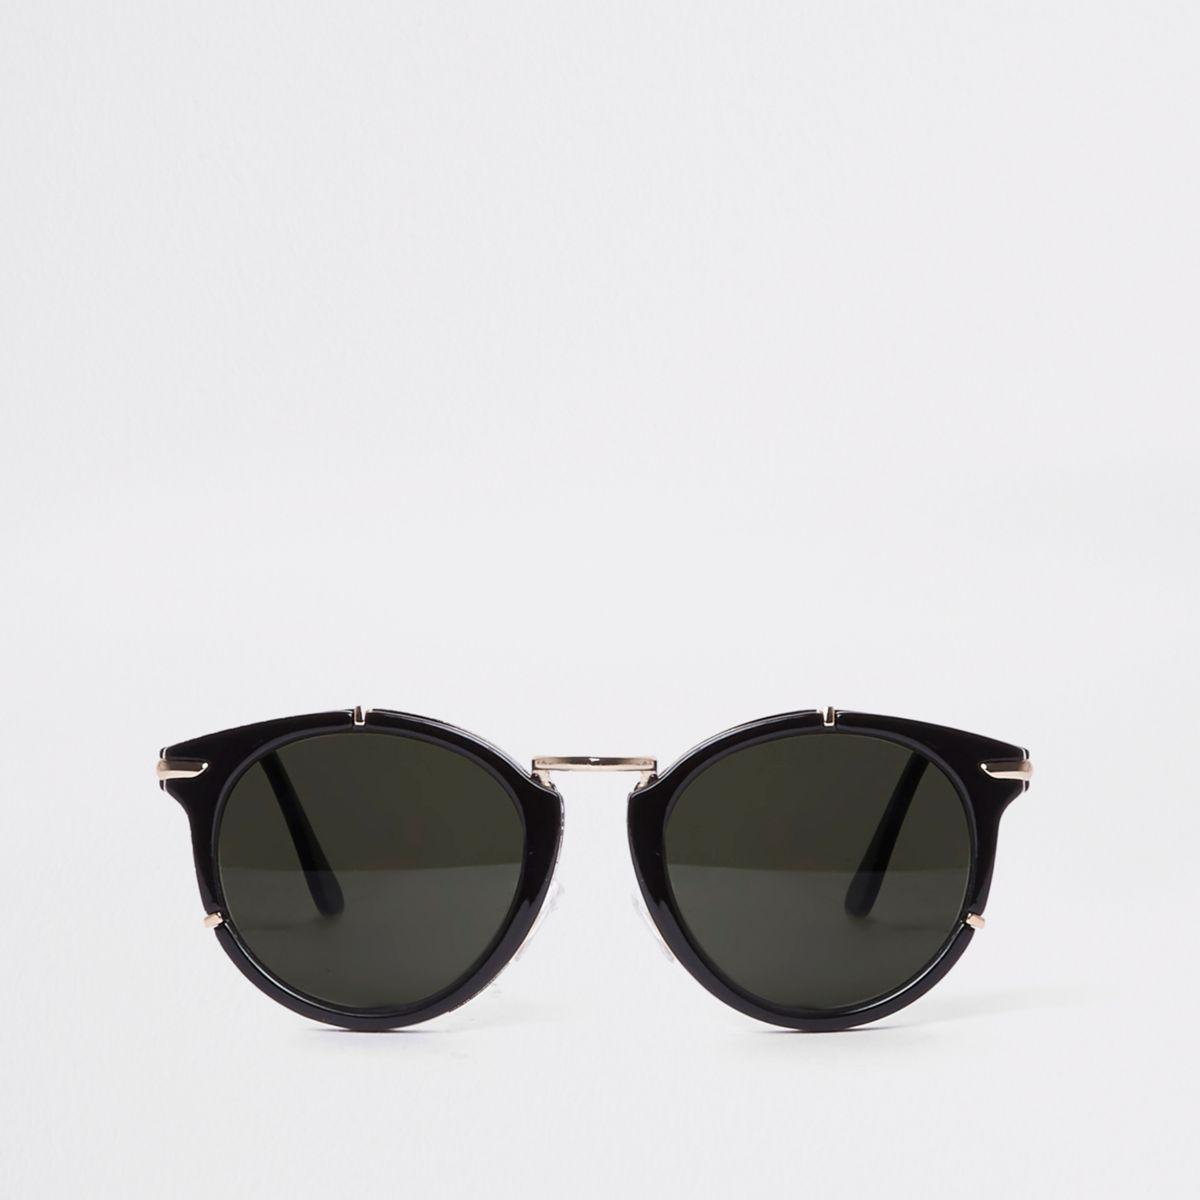 Black gold tone cat eye sunglasses